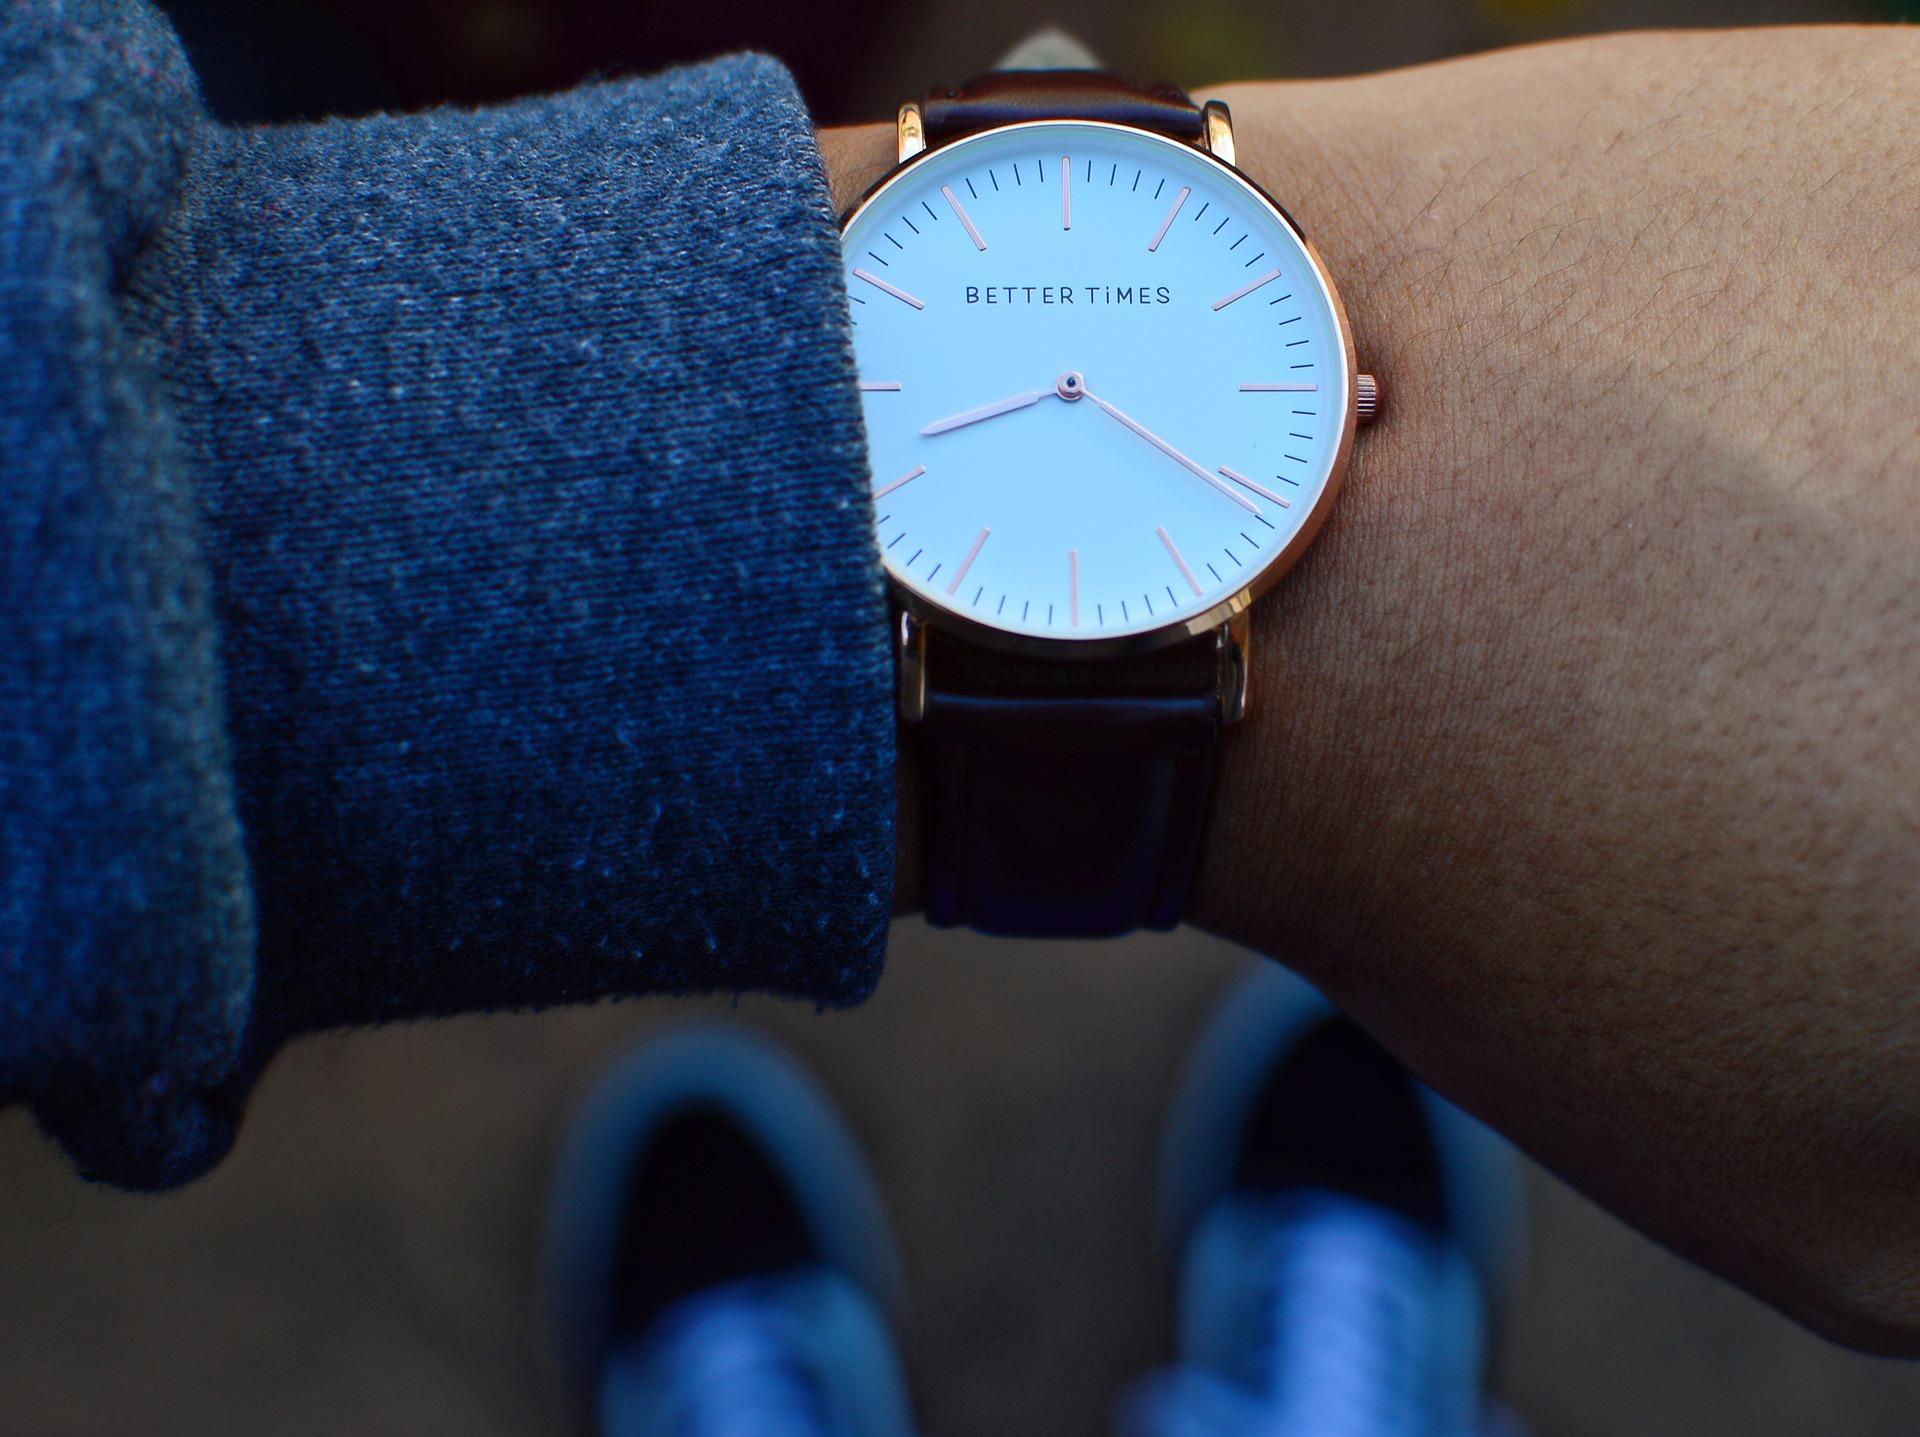 watch-1208003_1920